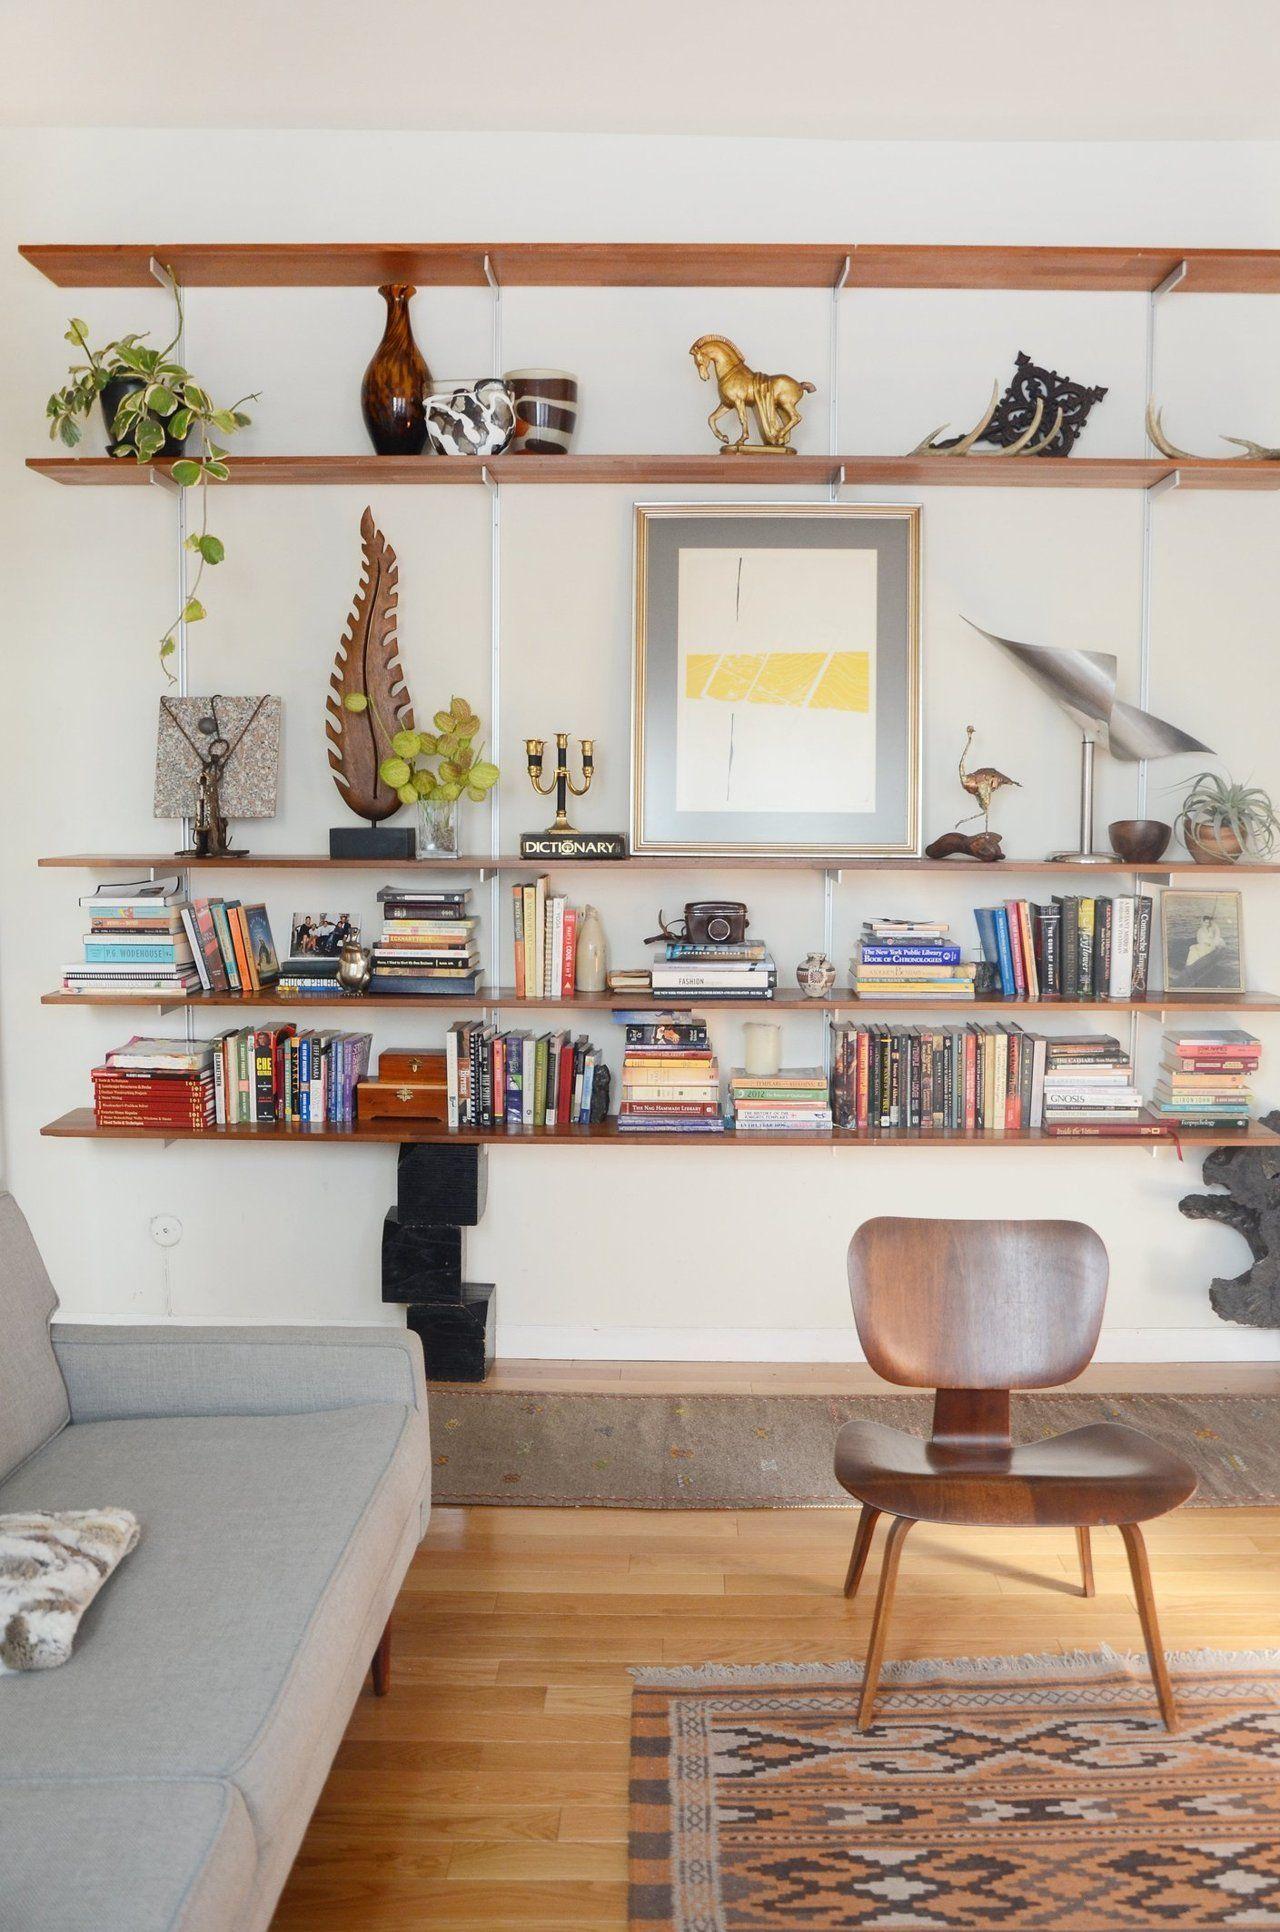 Rental Apartment Living Room Decorating Ideas: A Relaxed, Organic Modern San Francisco Rental